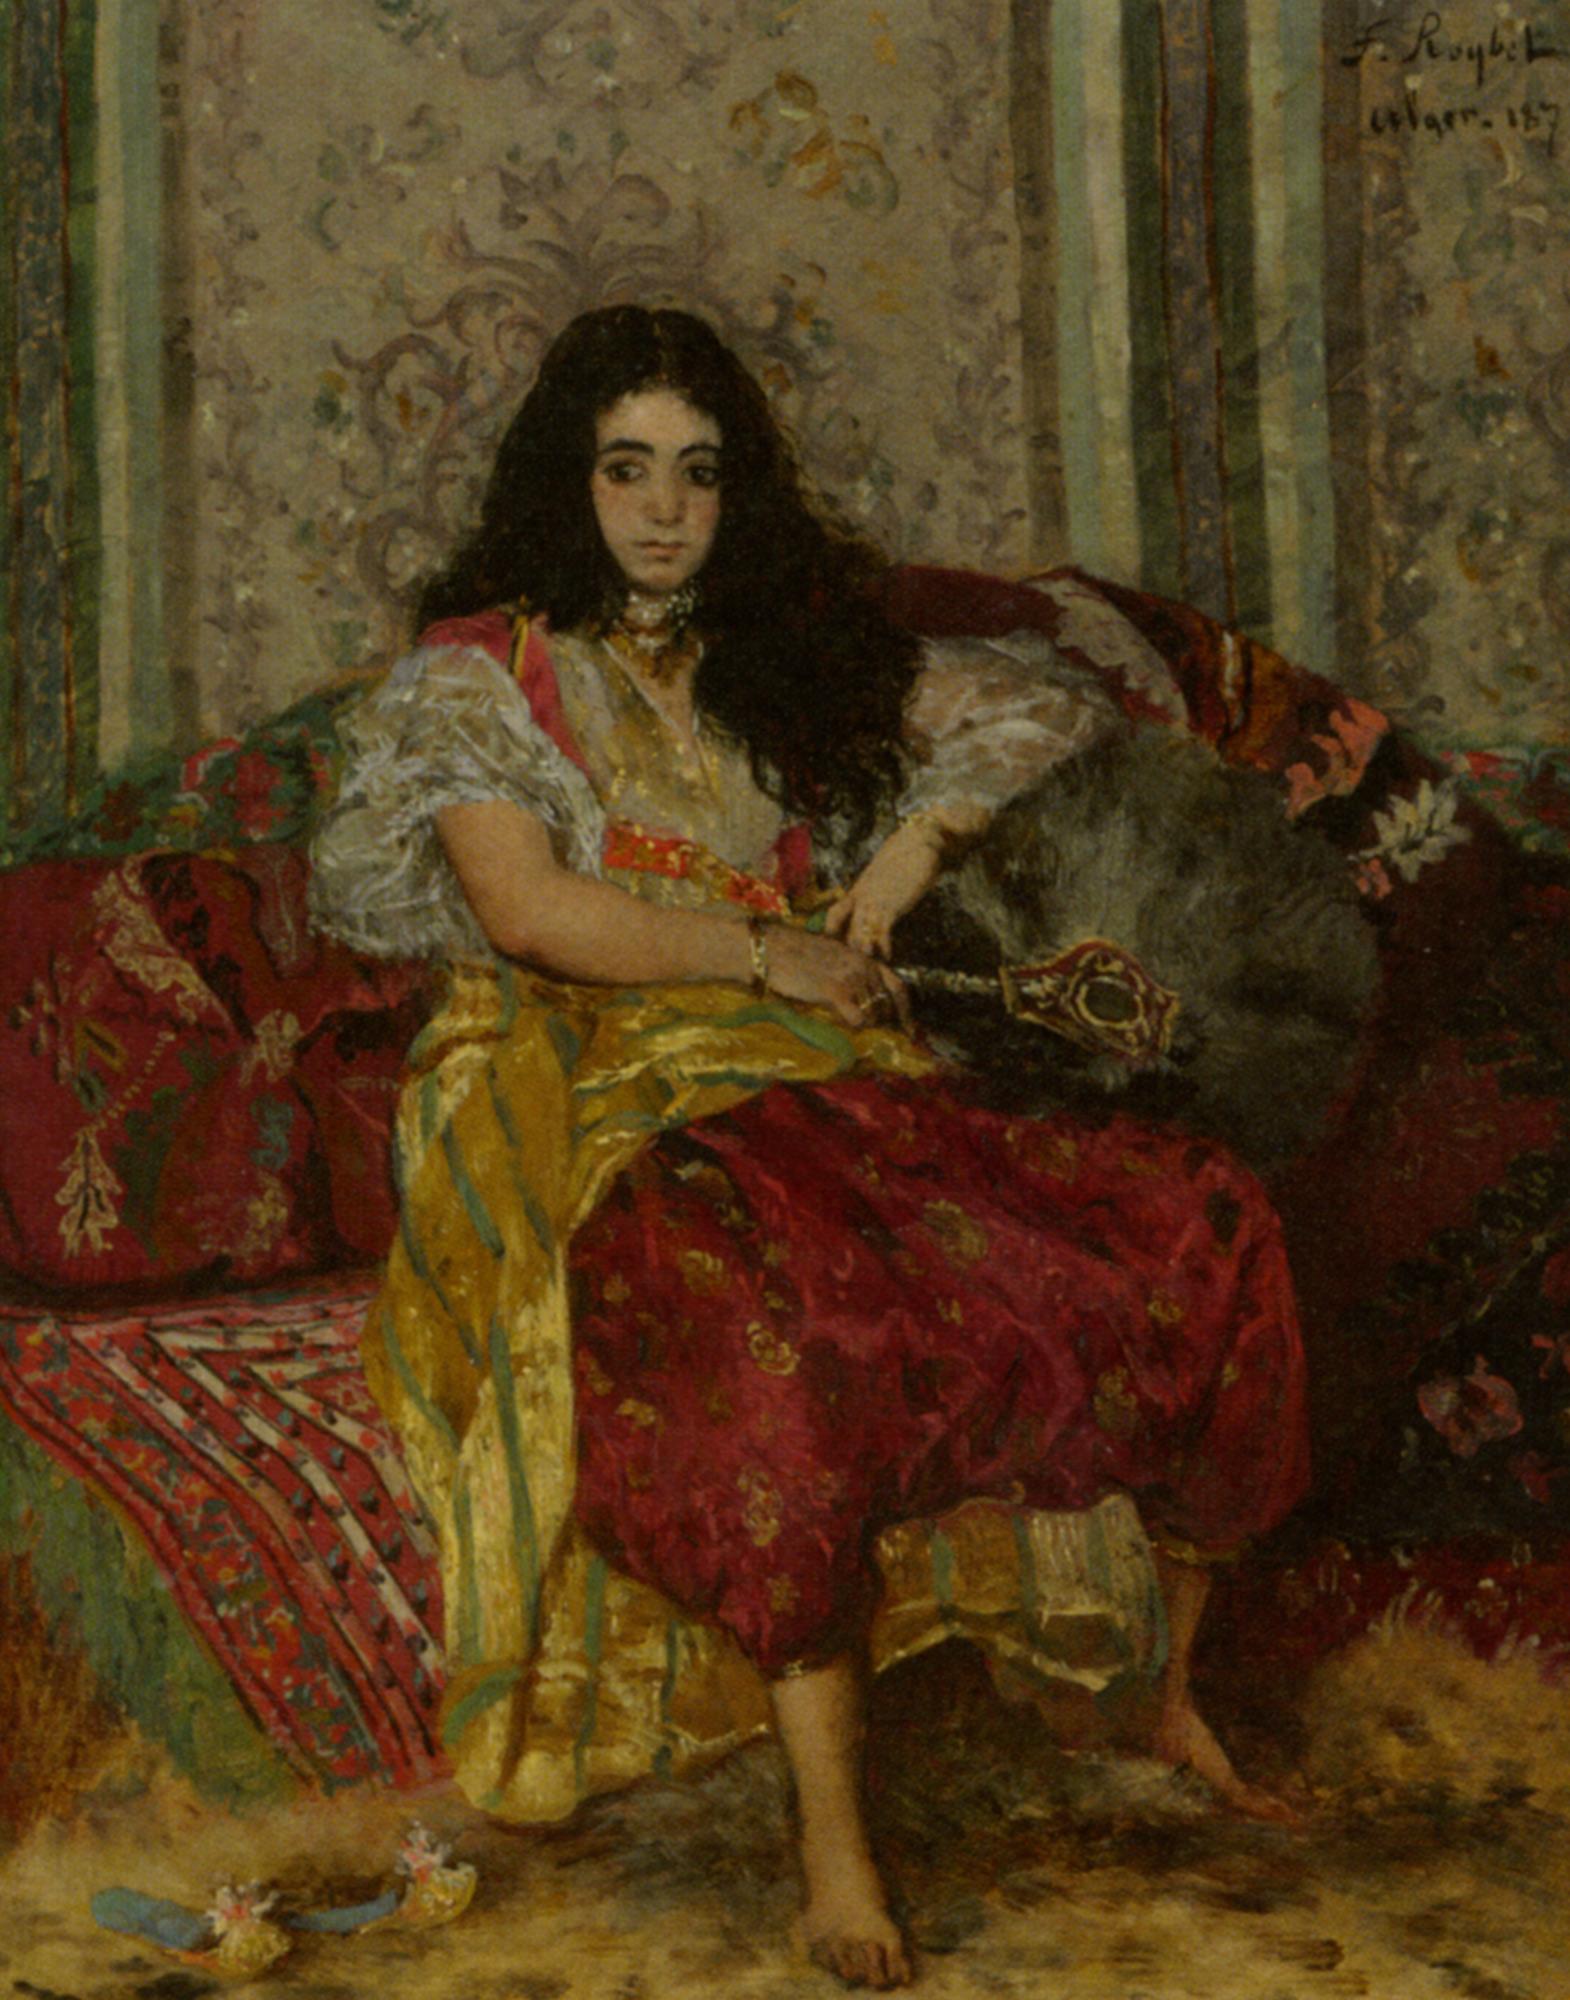 The Sultana :: Ferdinand Roybet - Arab women (Harem Life scenes) in art  and painting ôîòî